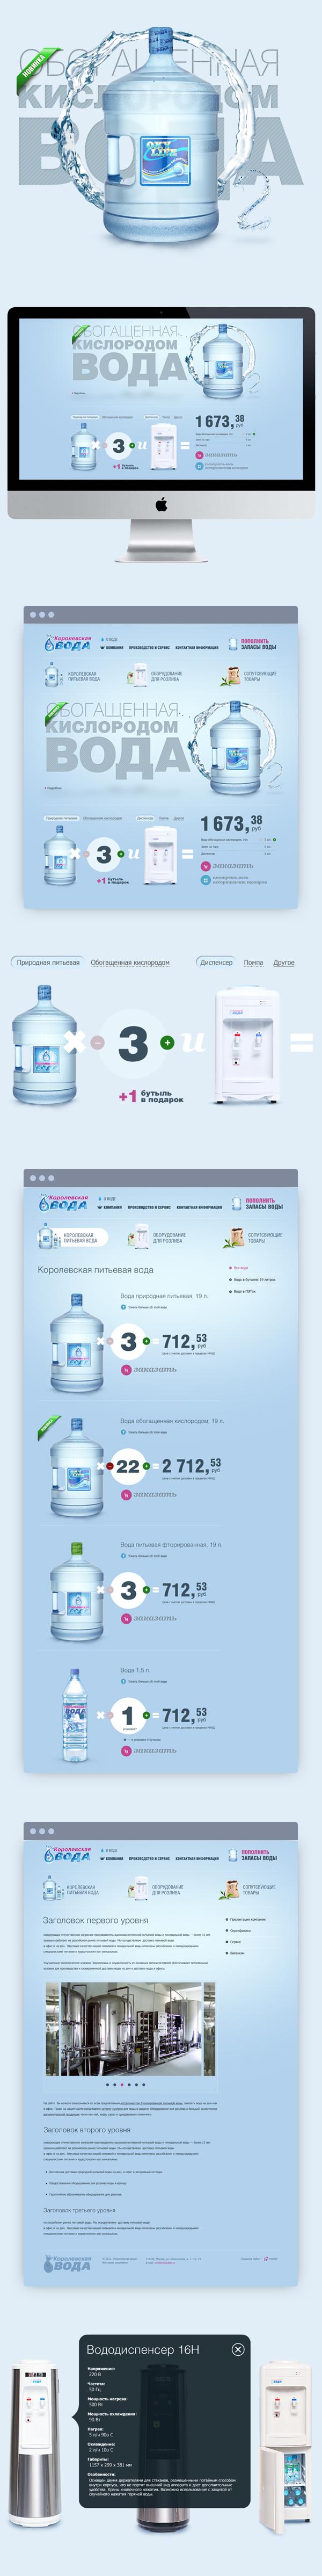 King S Water By Vladimir Rusnak Via Behance Water Water Delivery Water Dispenser